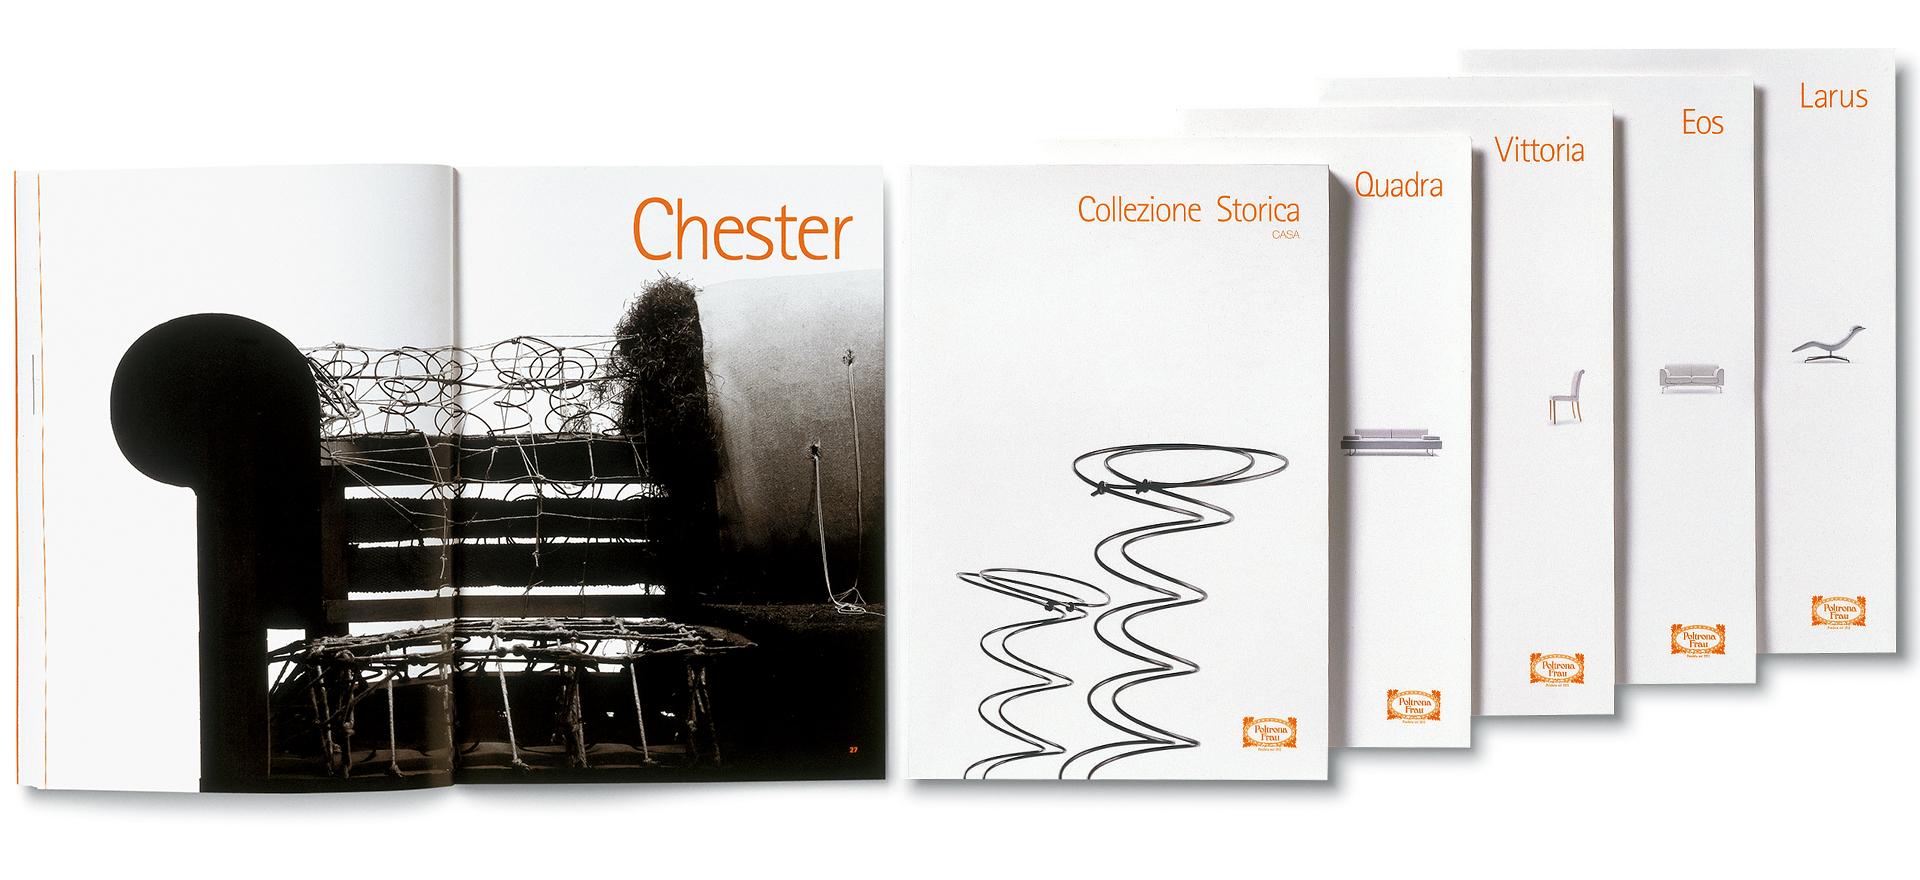 Product Catalogue | Art Direction | Graphic Design | Branding | Poltrona Frau | Mario Trimarchi Design | Fragile